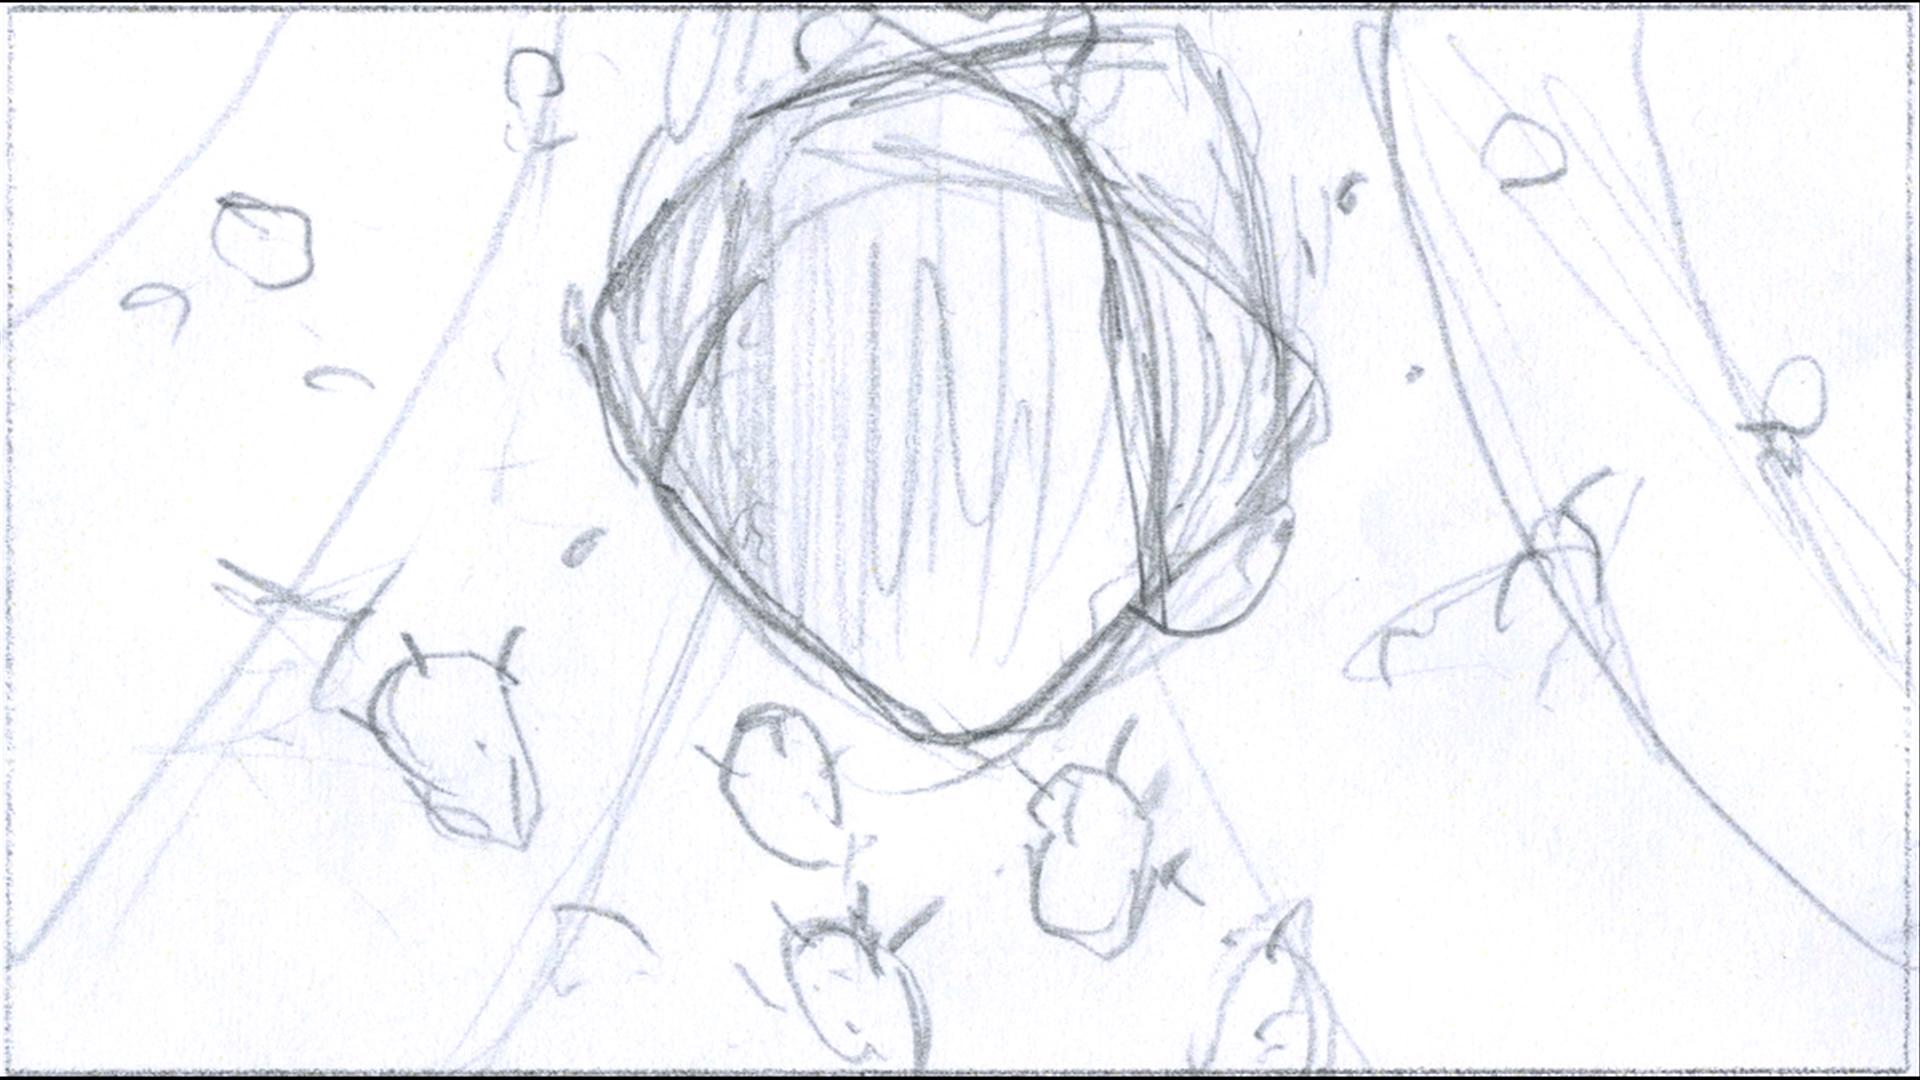 Animatic_10_2_12 (1-01-30-00).jpg